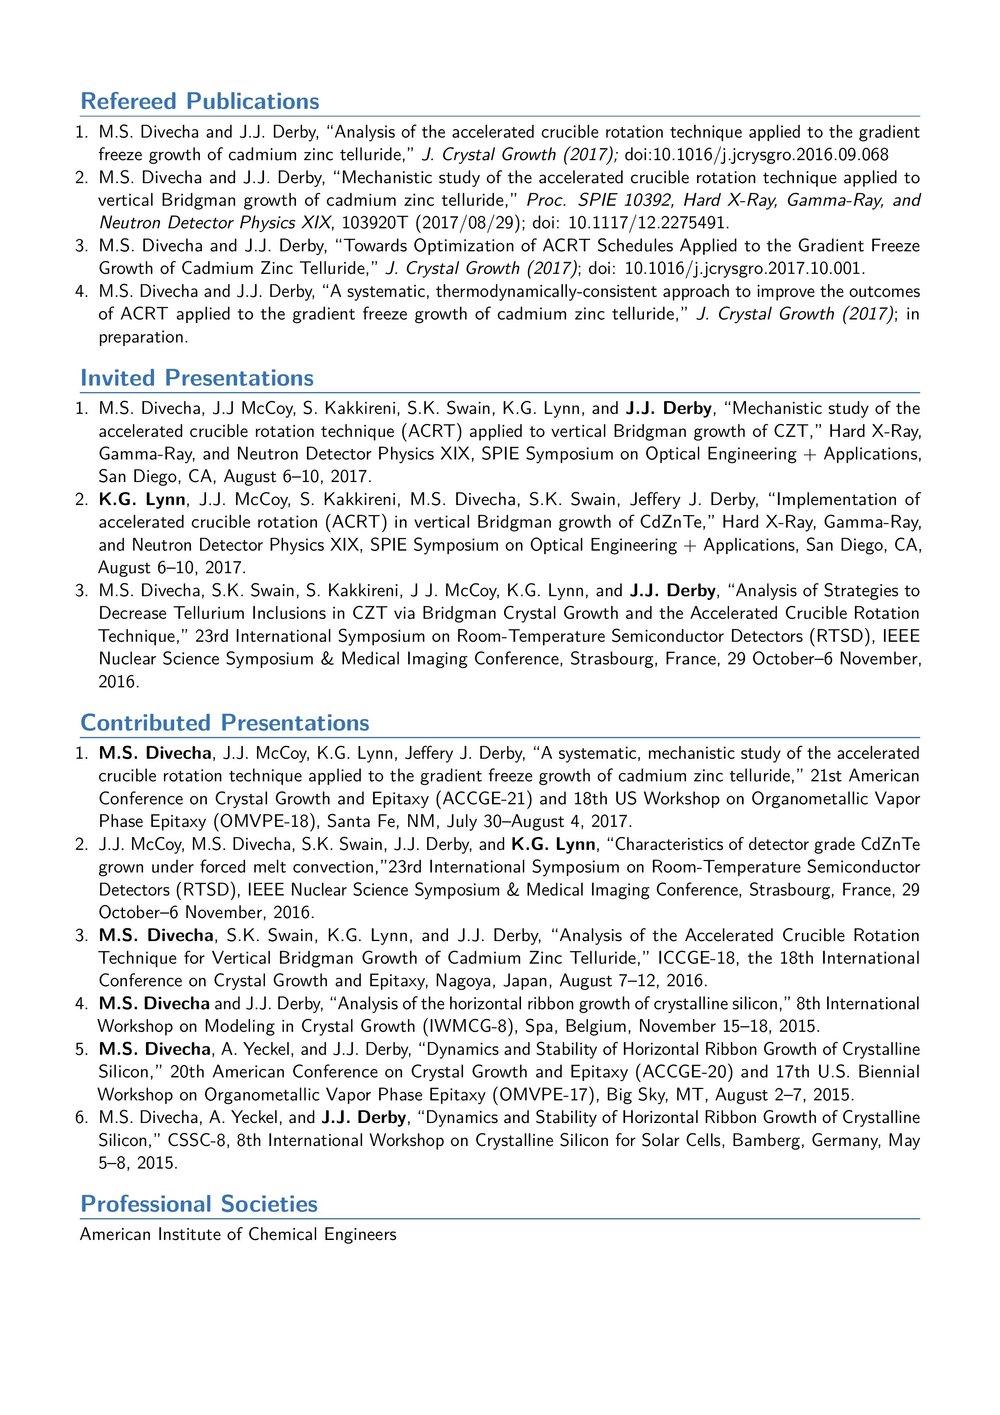 Divecha_CV_201702_v3-page-002.jpg